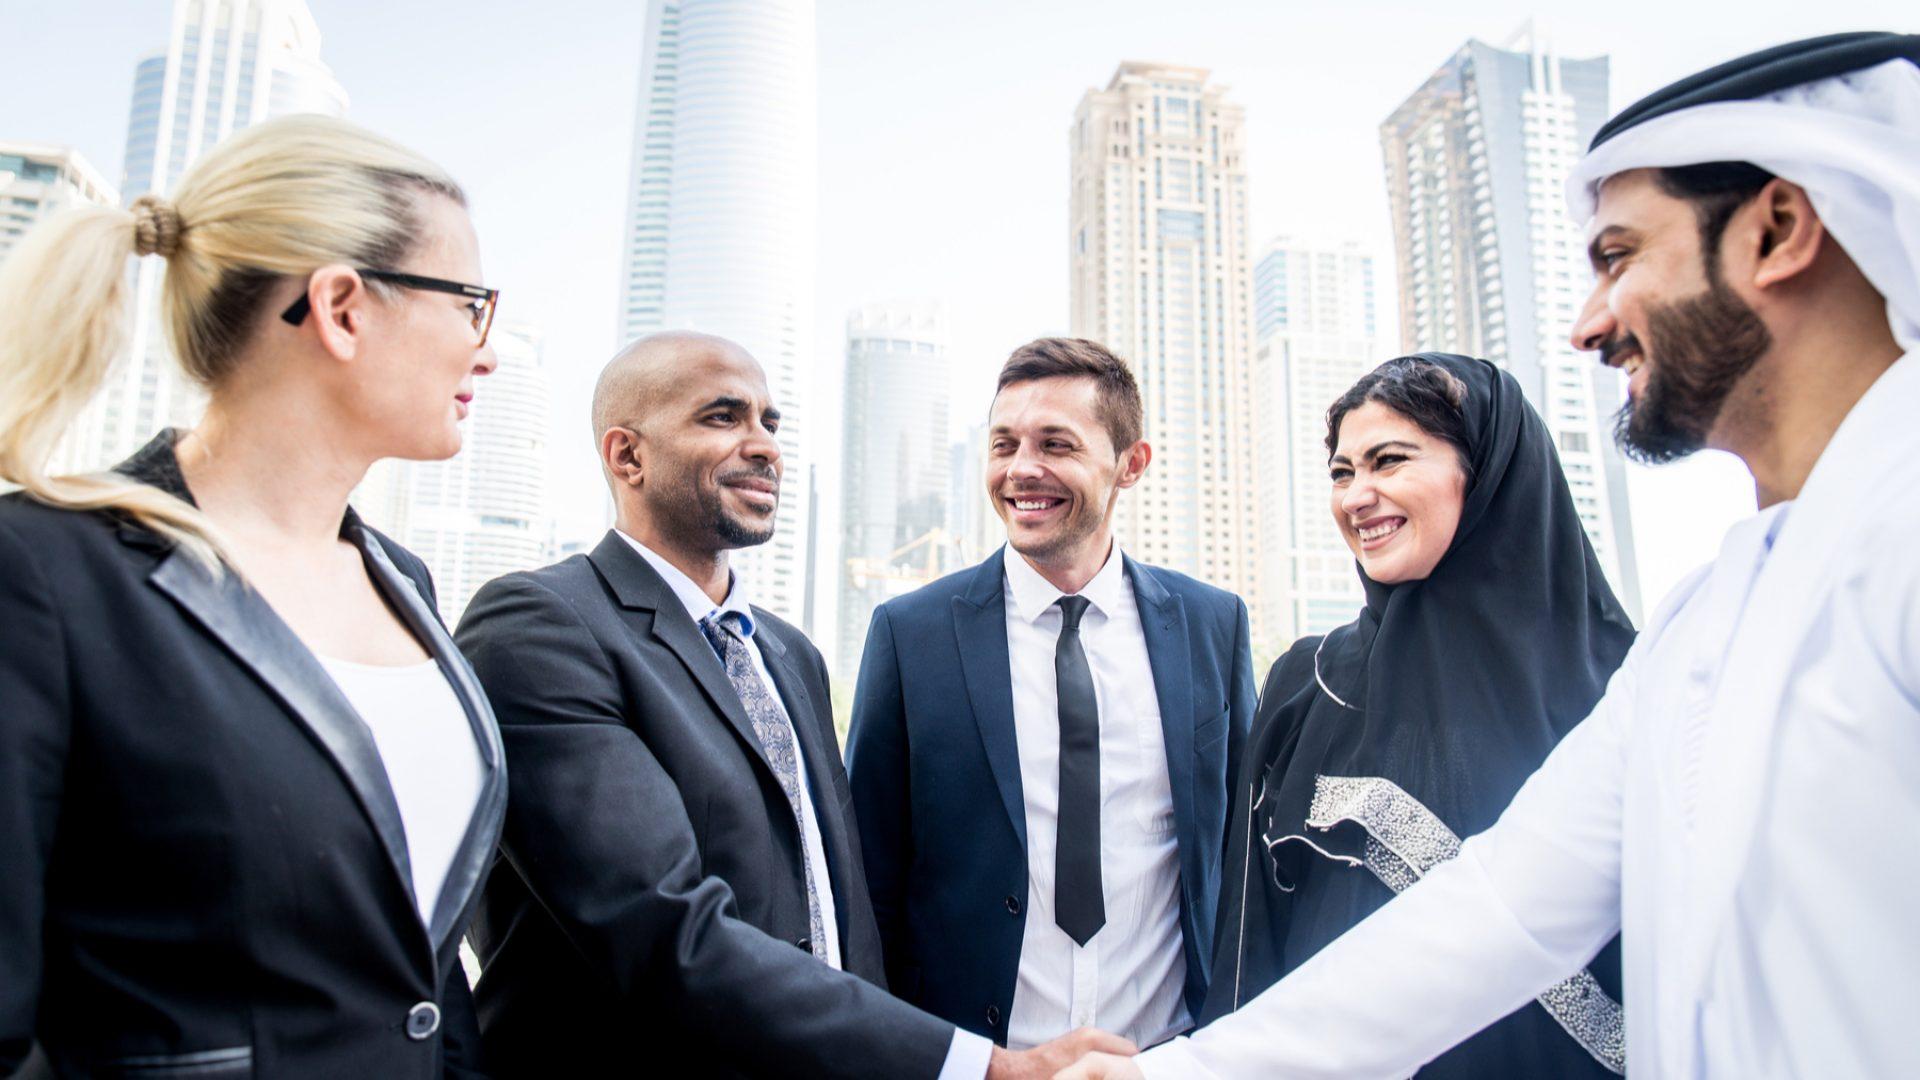 Average salary in UAE